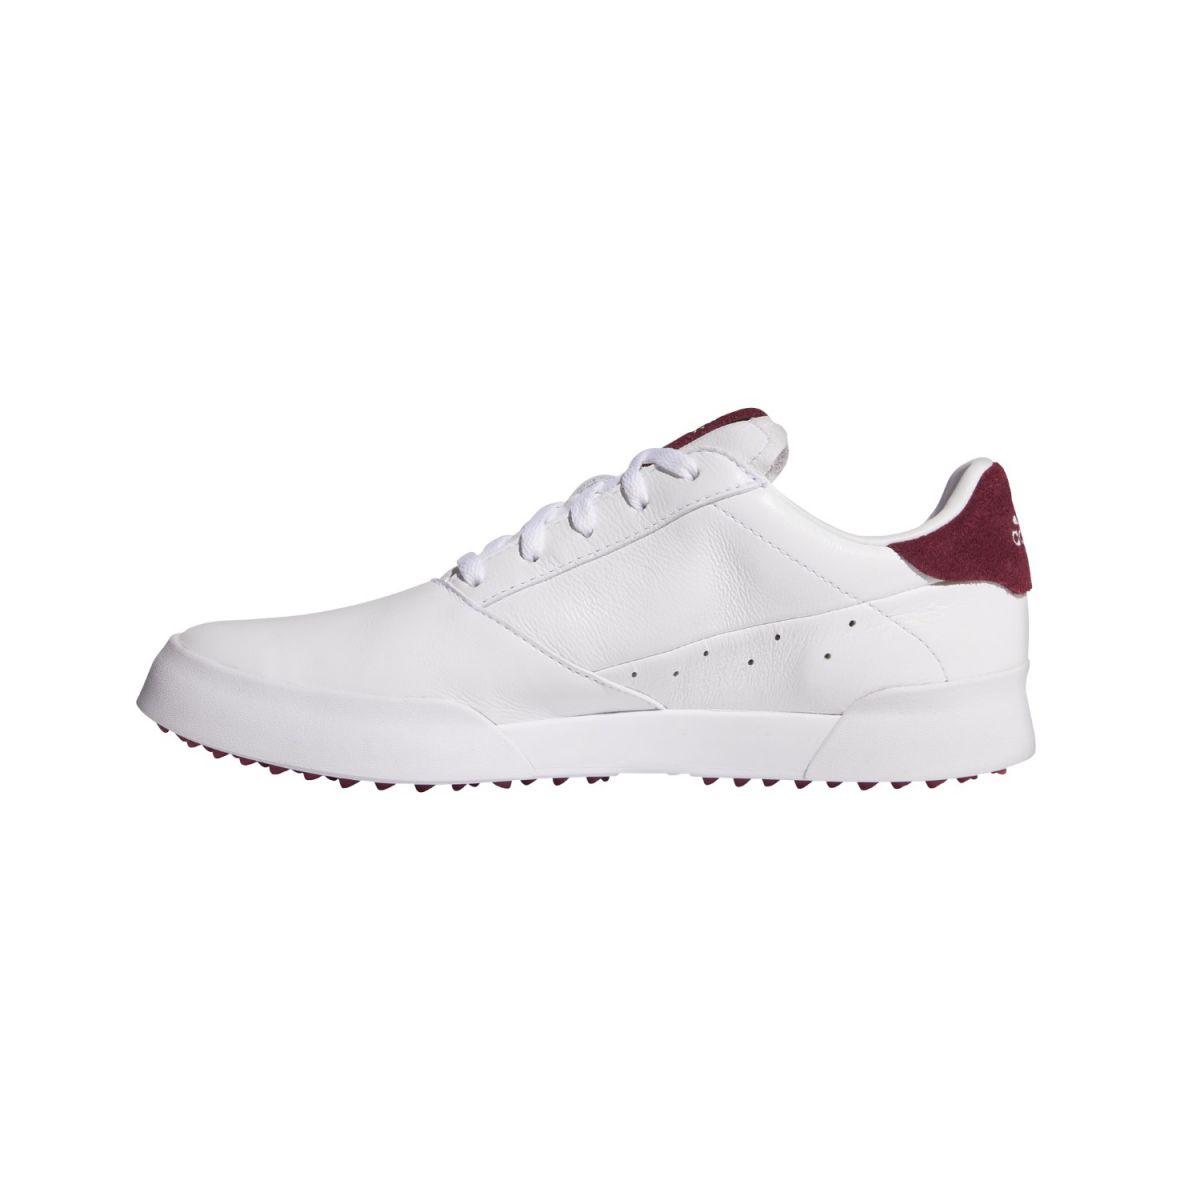 adidas w adicross retro white red 40